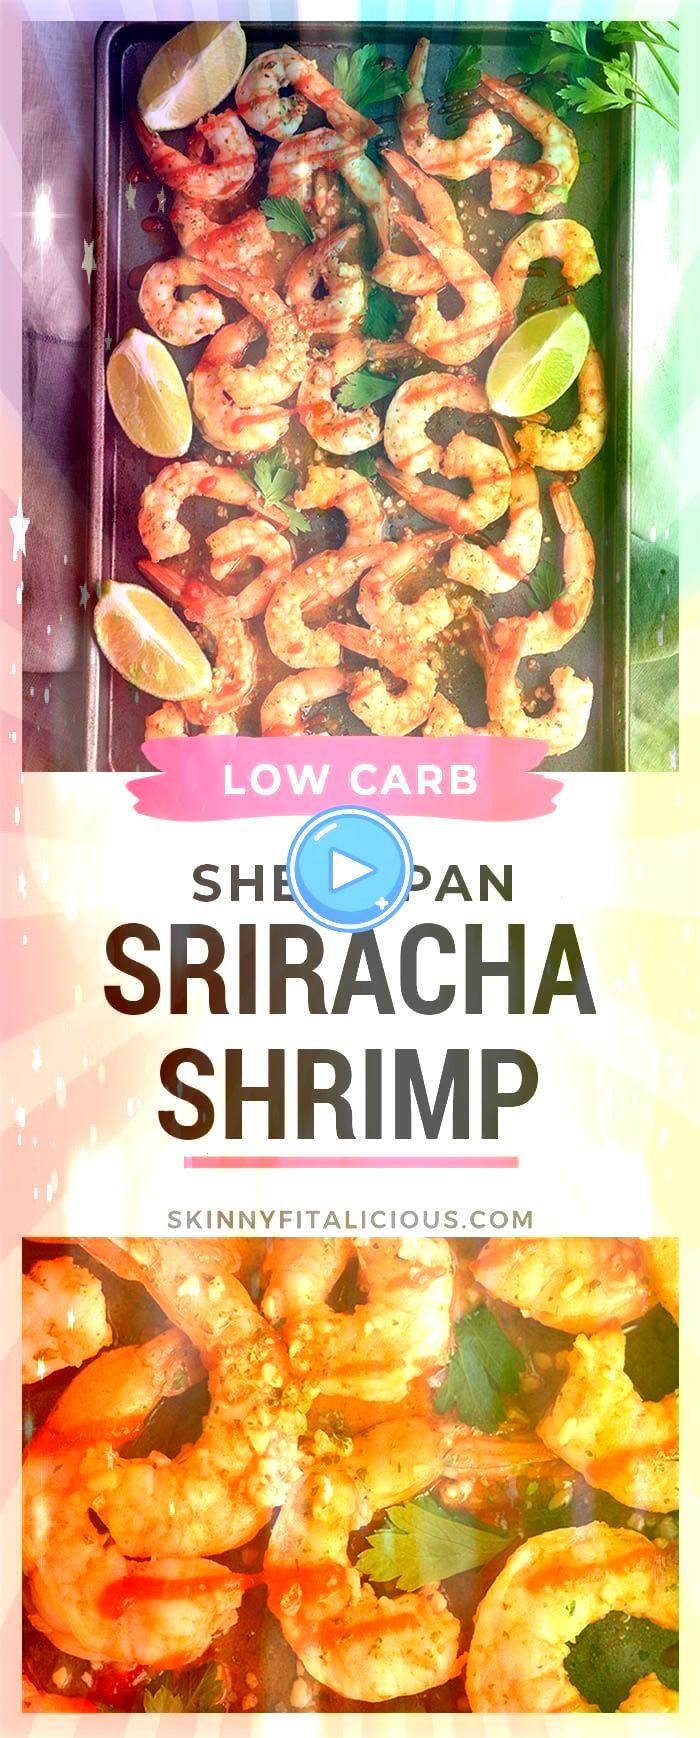 Sriracha Shrimp hat zwei Möglichkeiten Zarte Garnelen in Knoblauch Limette   Kalorienarme Rezepte Spicy Sriracha Shrimp hat zwei Möglichkeiten Zarte Garnelen in...